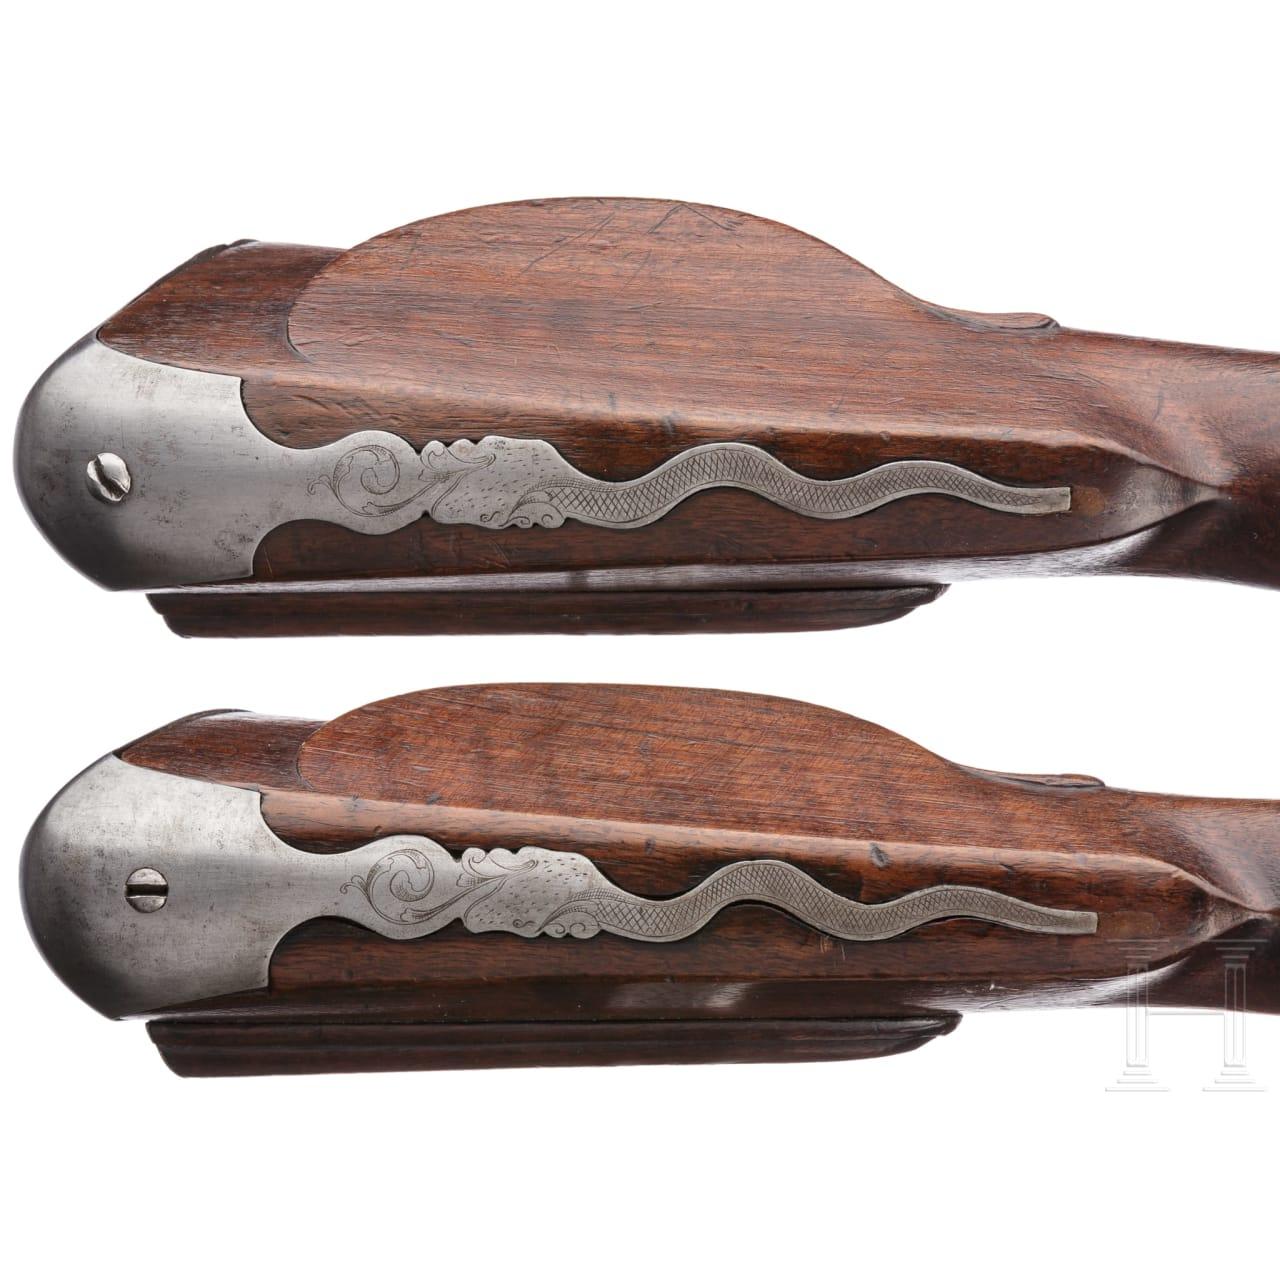 A pair of flintlock carbines by Jan Knoop in Utrecht, circa 1680